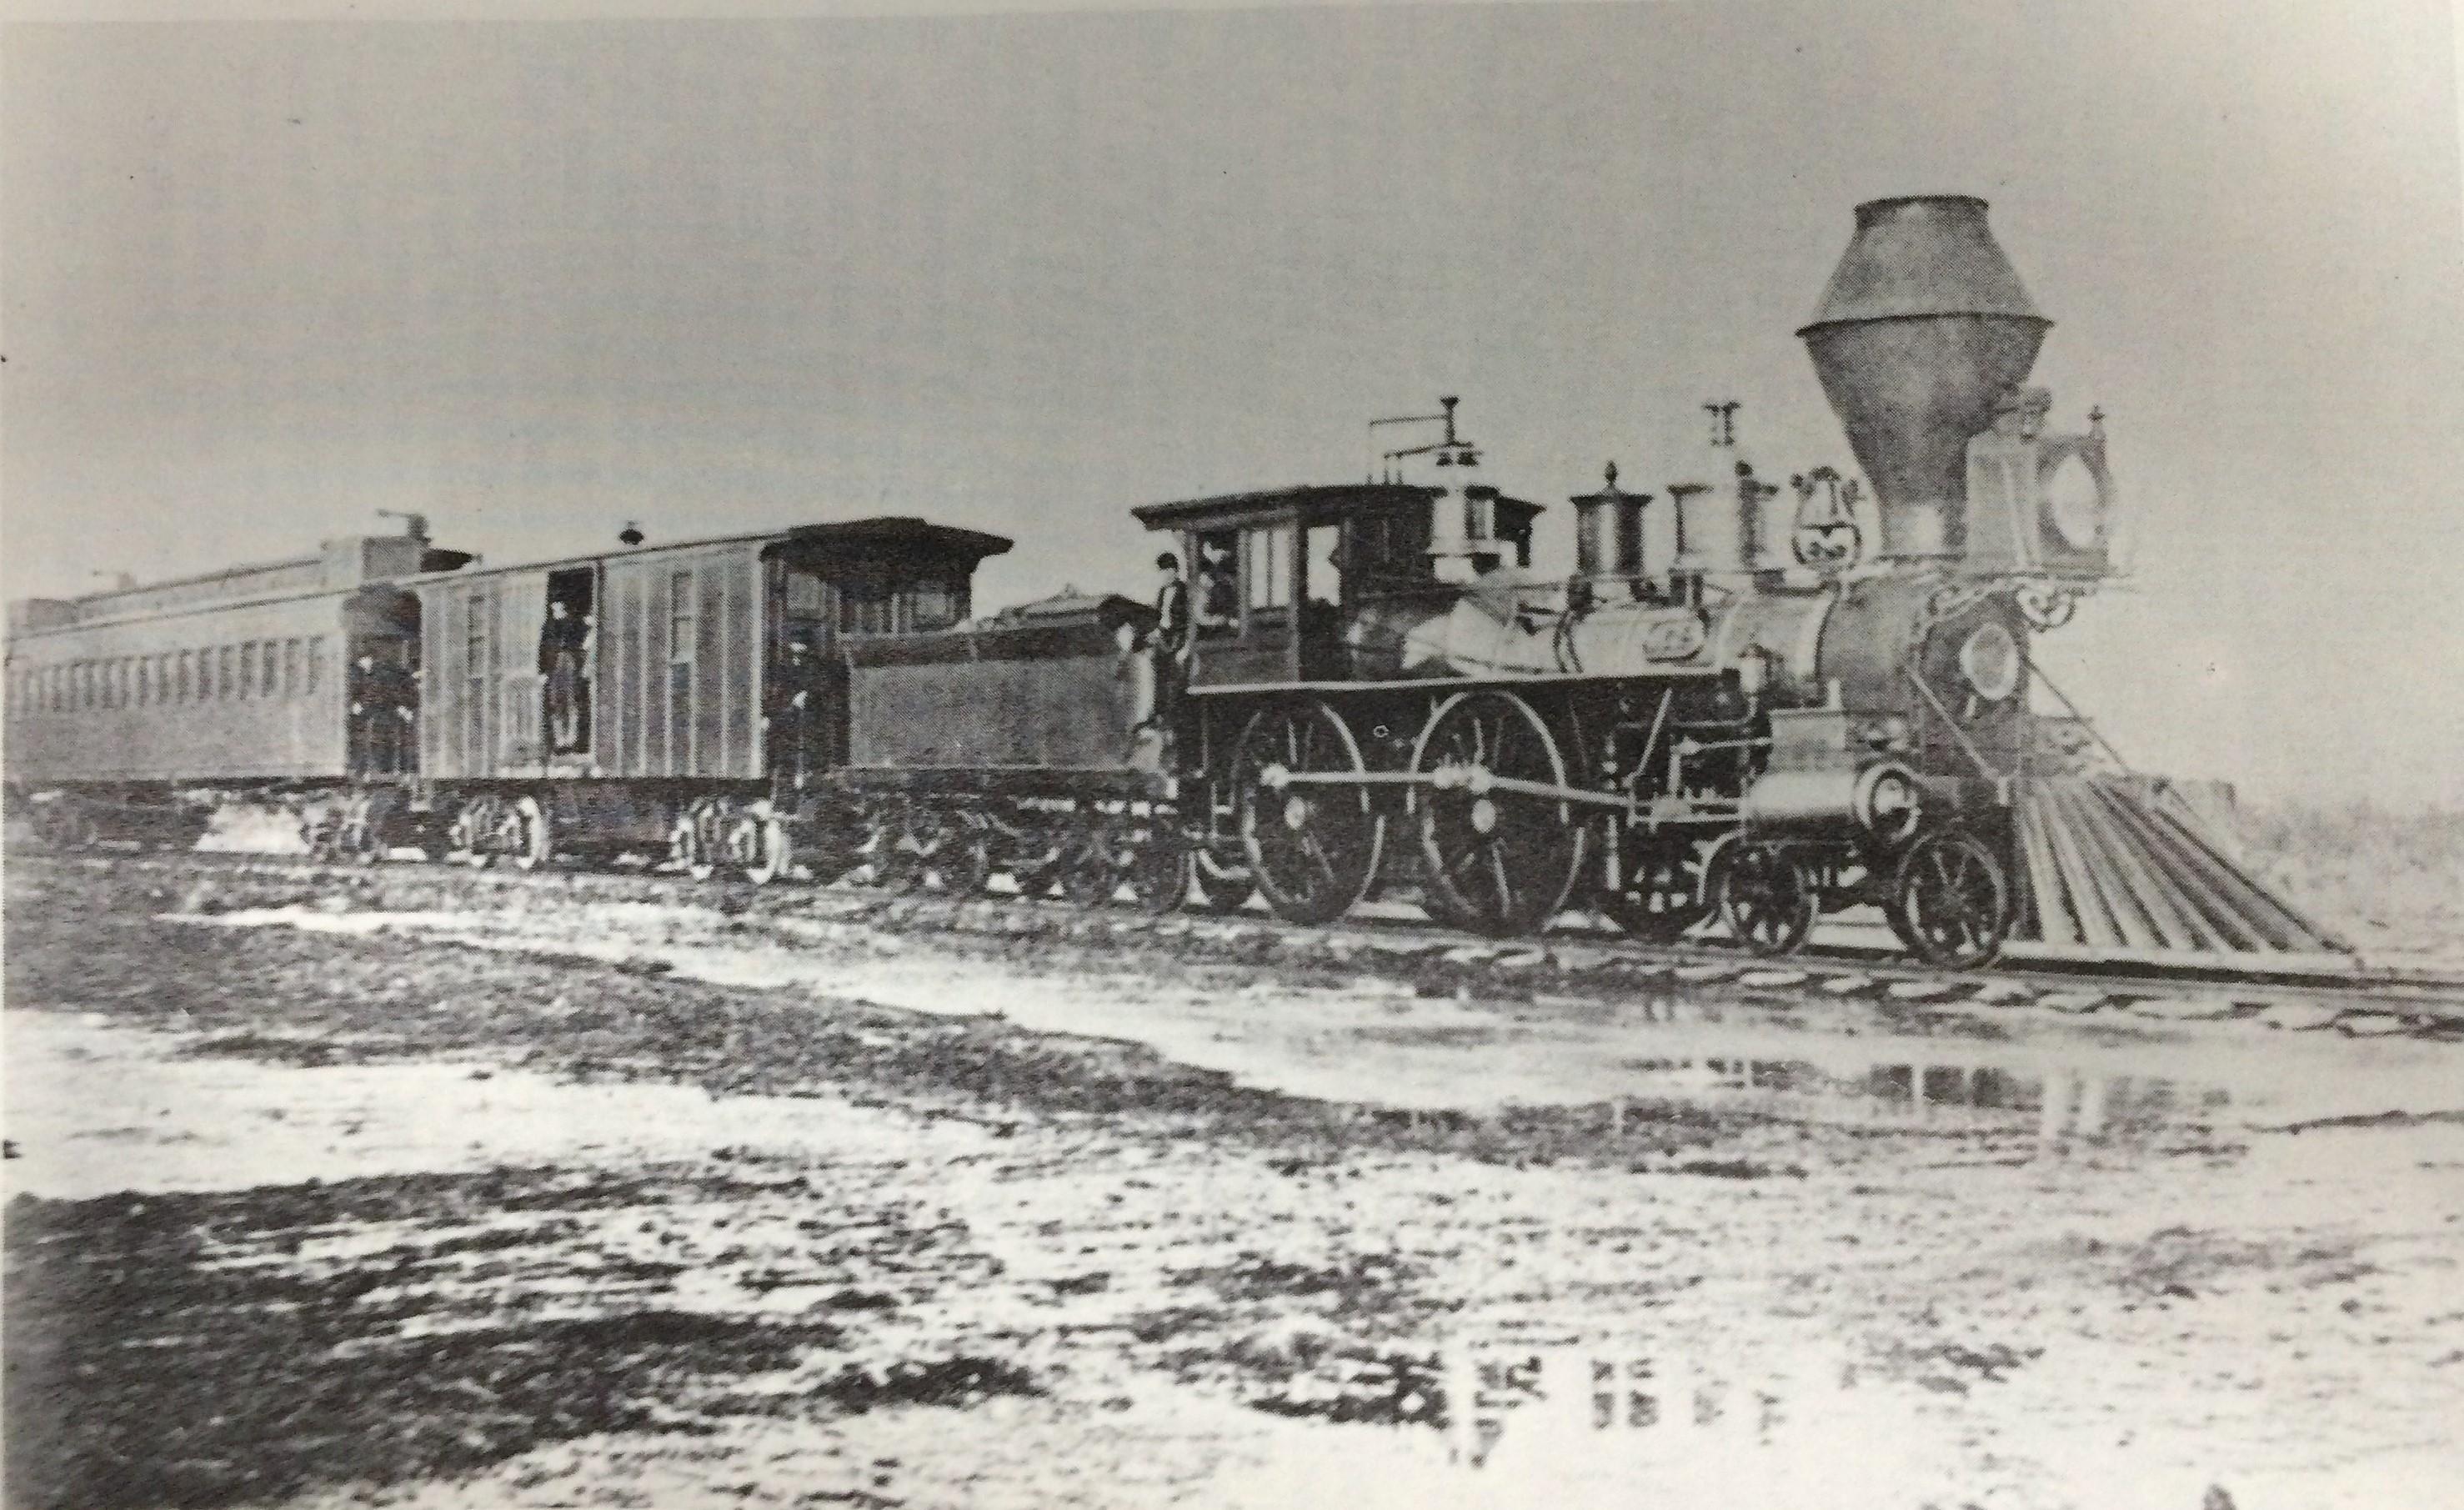 V.S.&P. RR locomotive